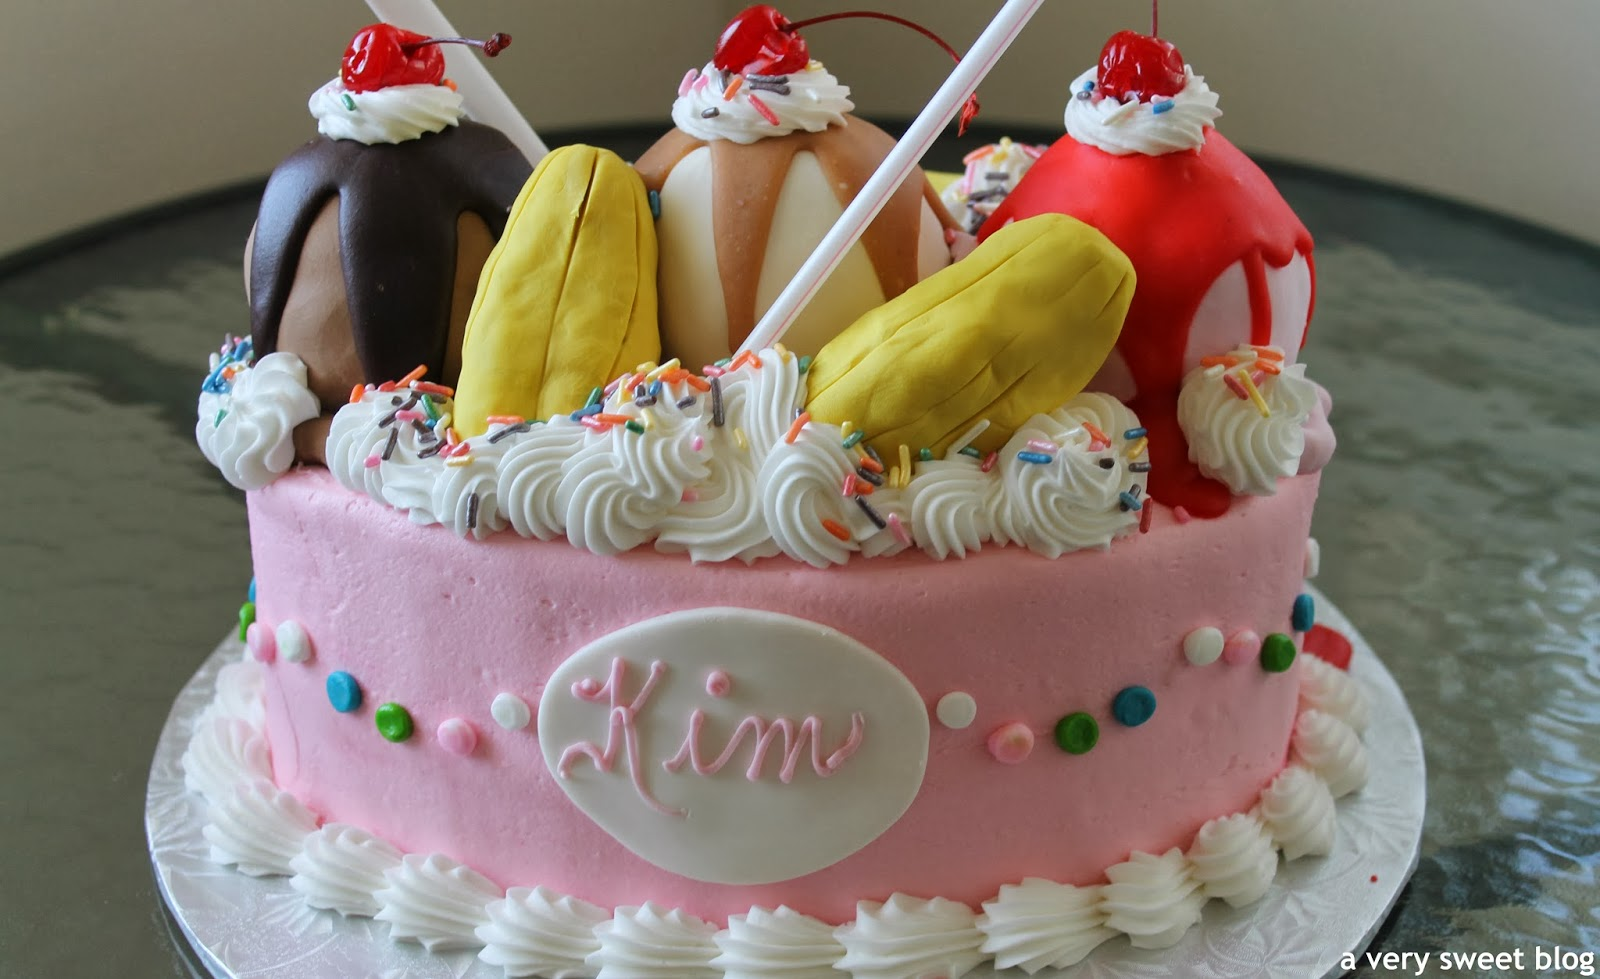 Birthday Cake Ice Cream Bananas Image Inspiration of Cake and